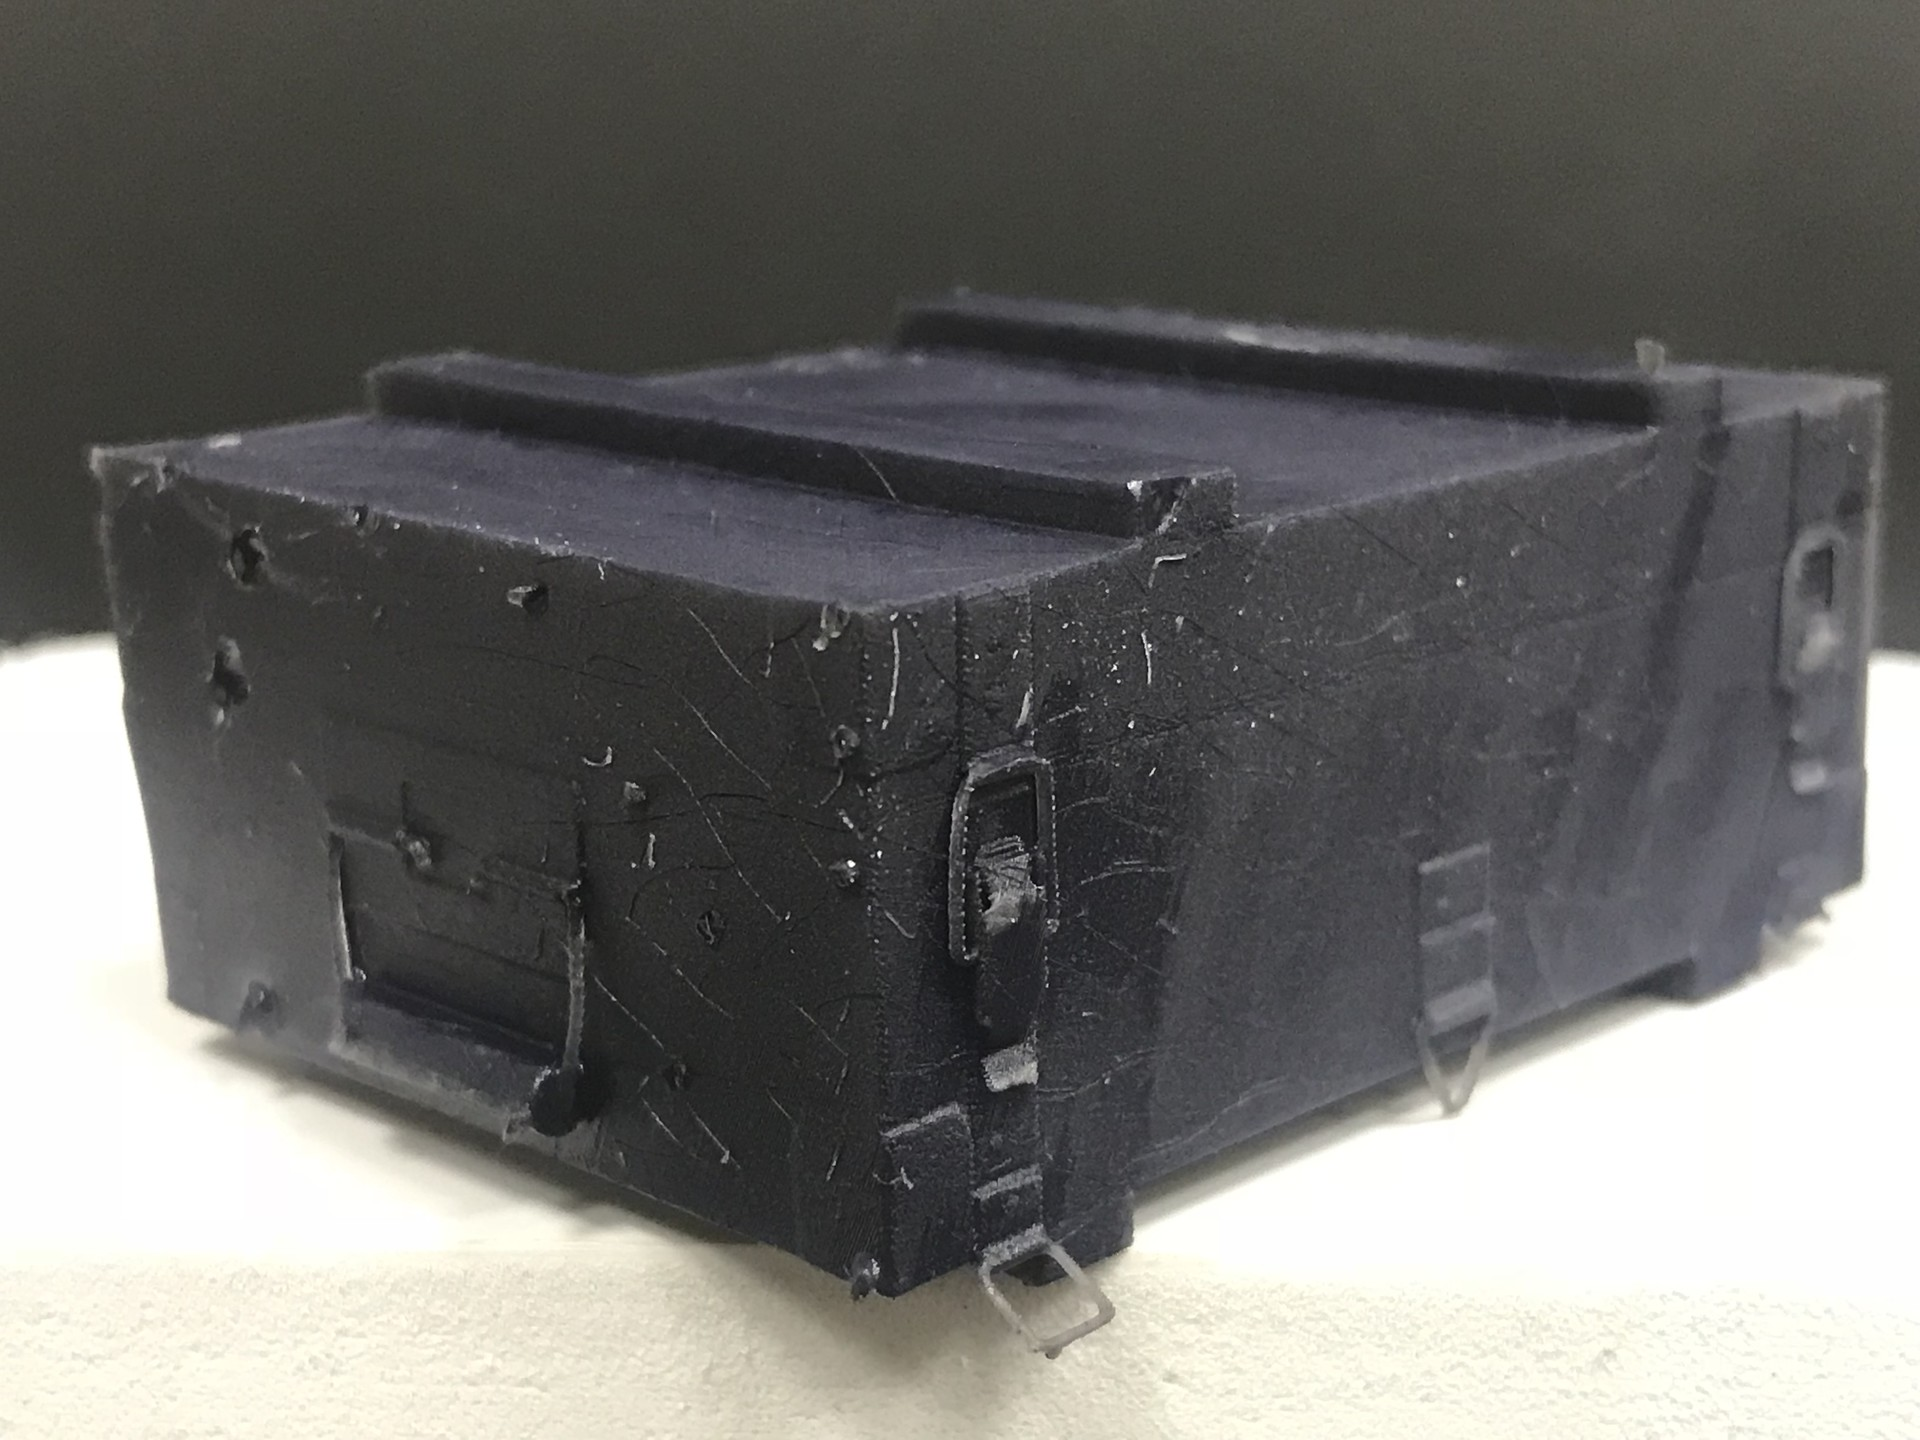 Kresimir jelusic robob3ar asset